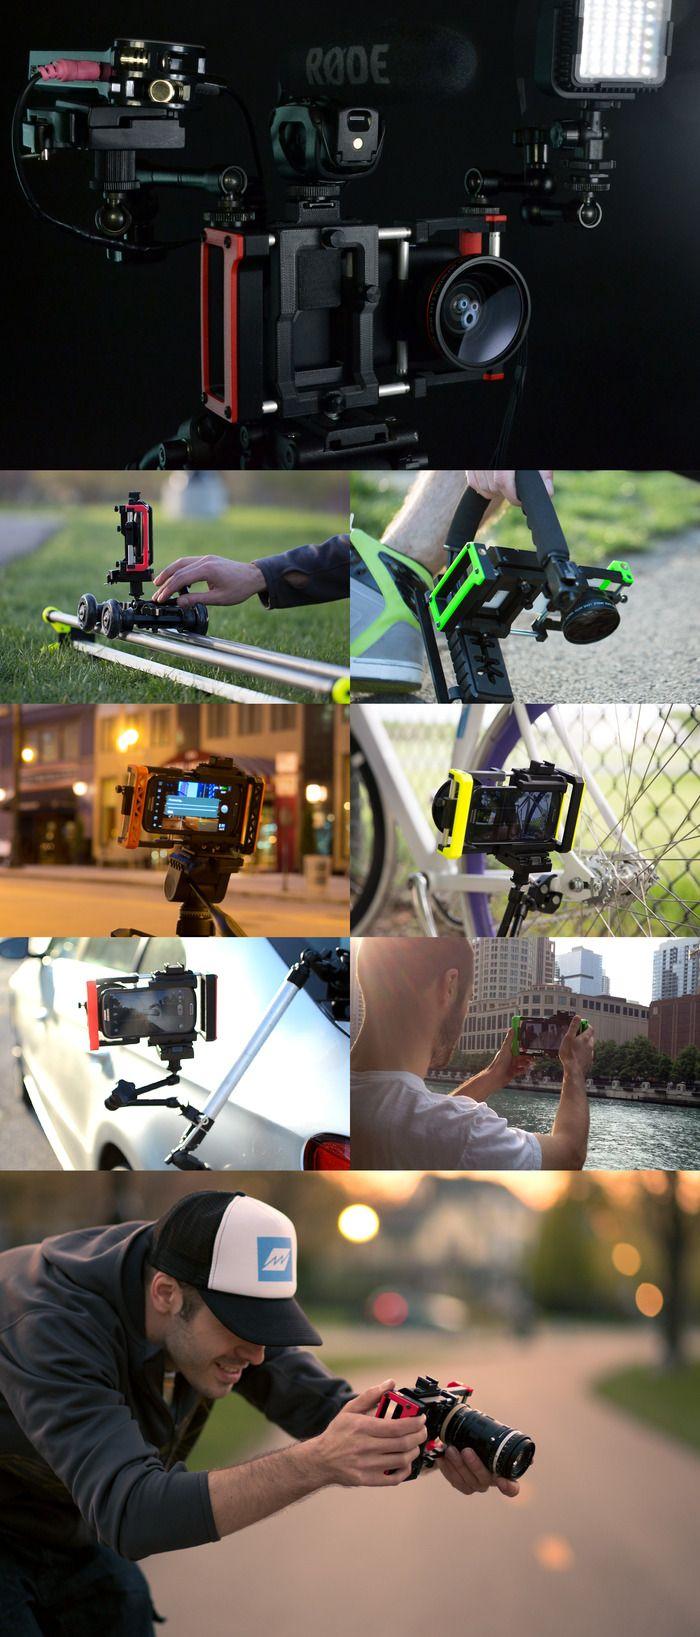 65d2858fac6088b9003adc10b4f0f9df camera phone film camera